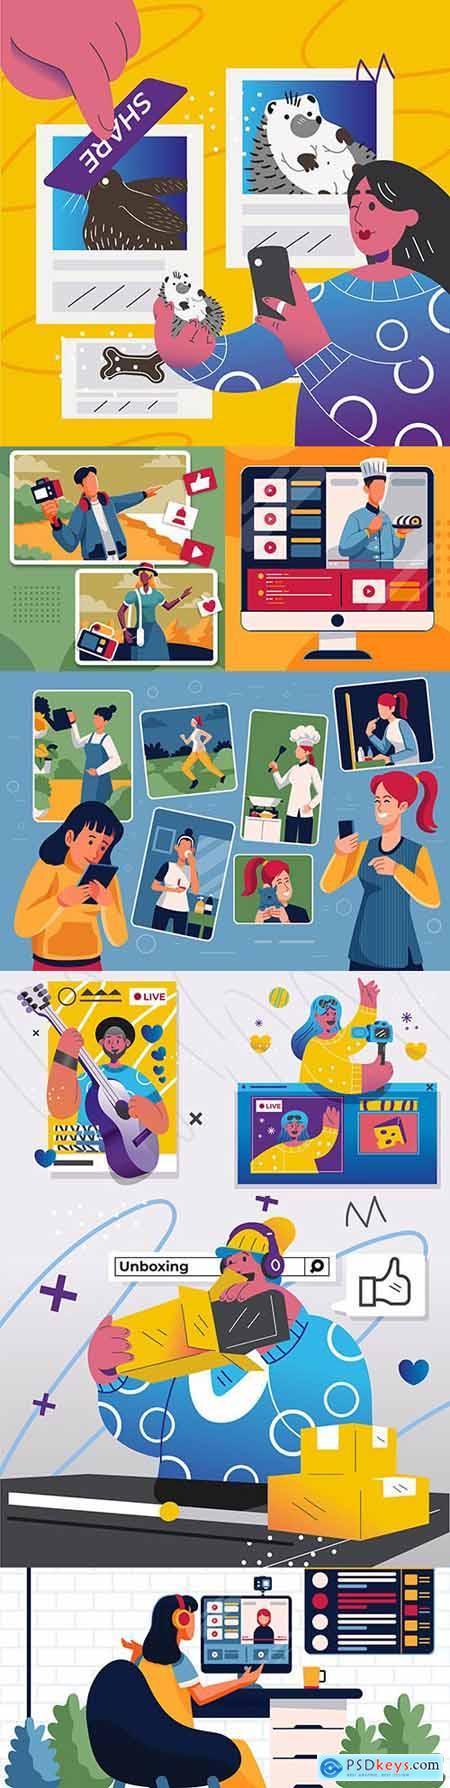 Video blogger shares content on social media illustration